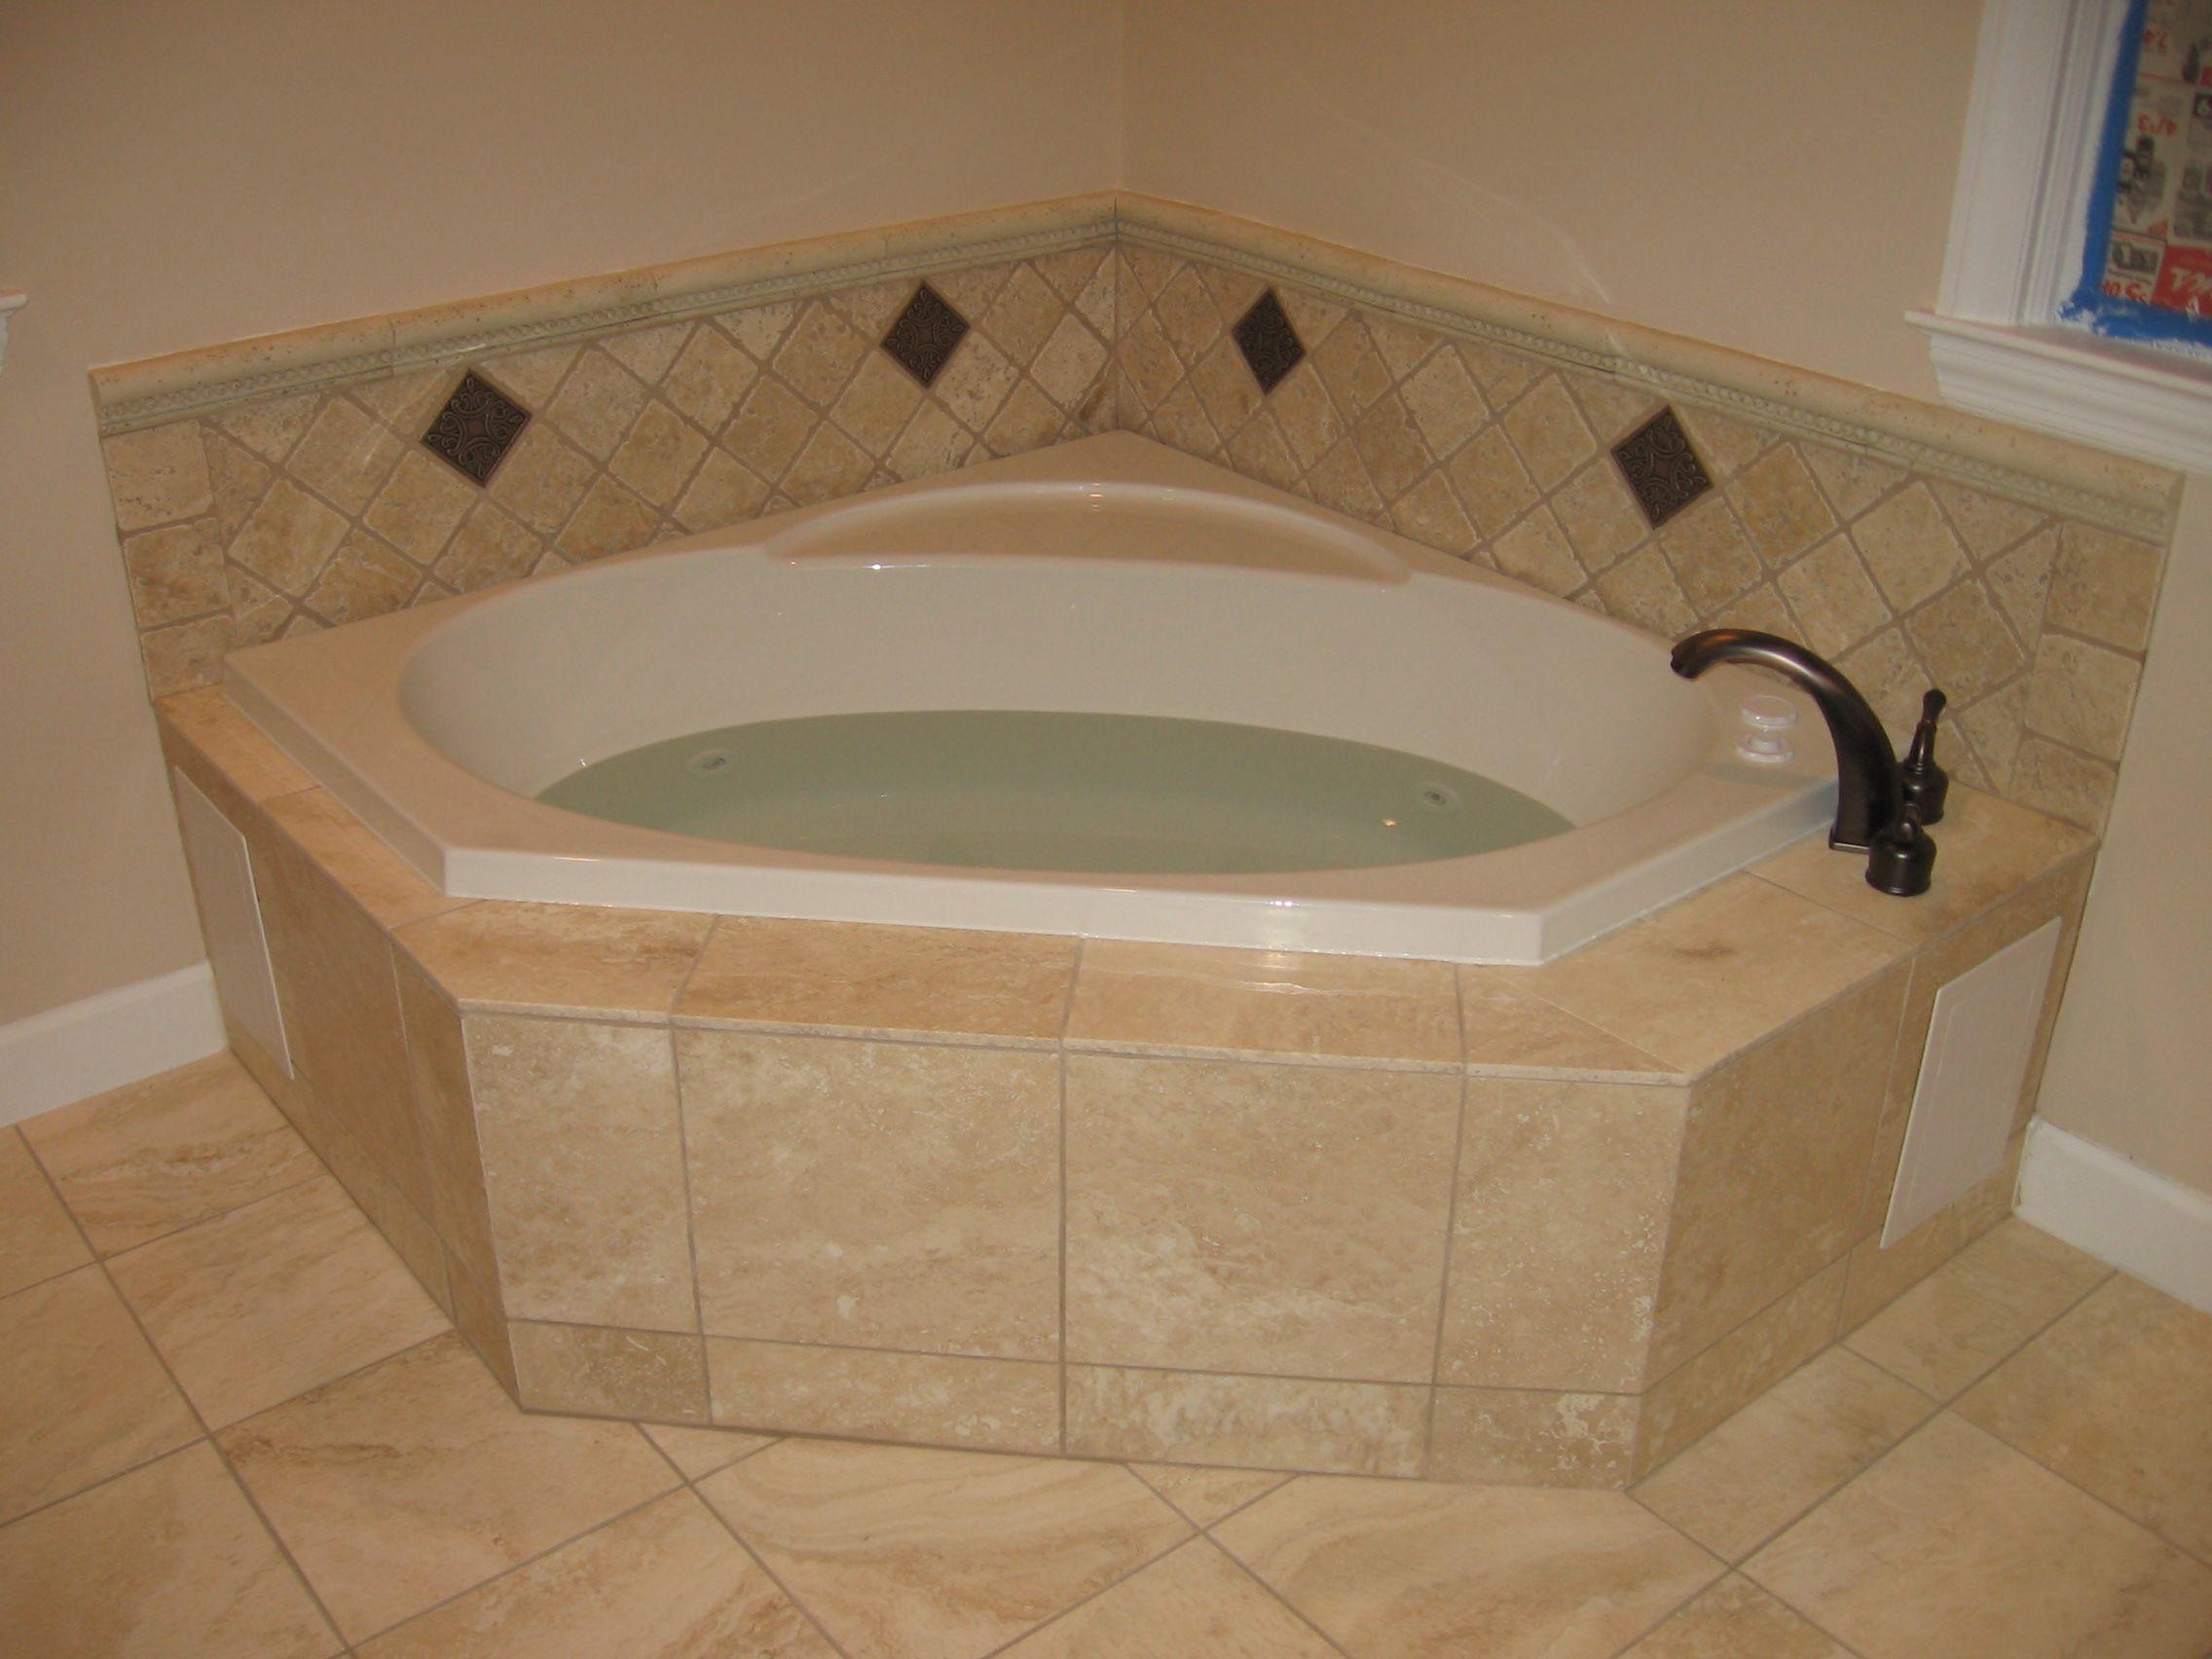 15 Interesting Whirlpool Corner Bathtub Picture Ideas Corner Tub Corner Bath Corner Bathtub